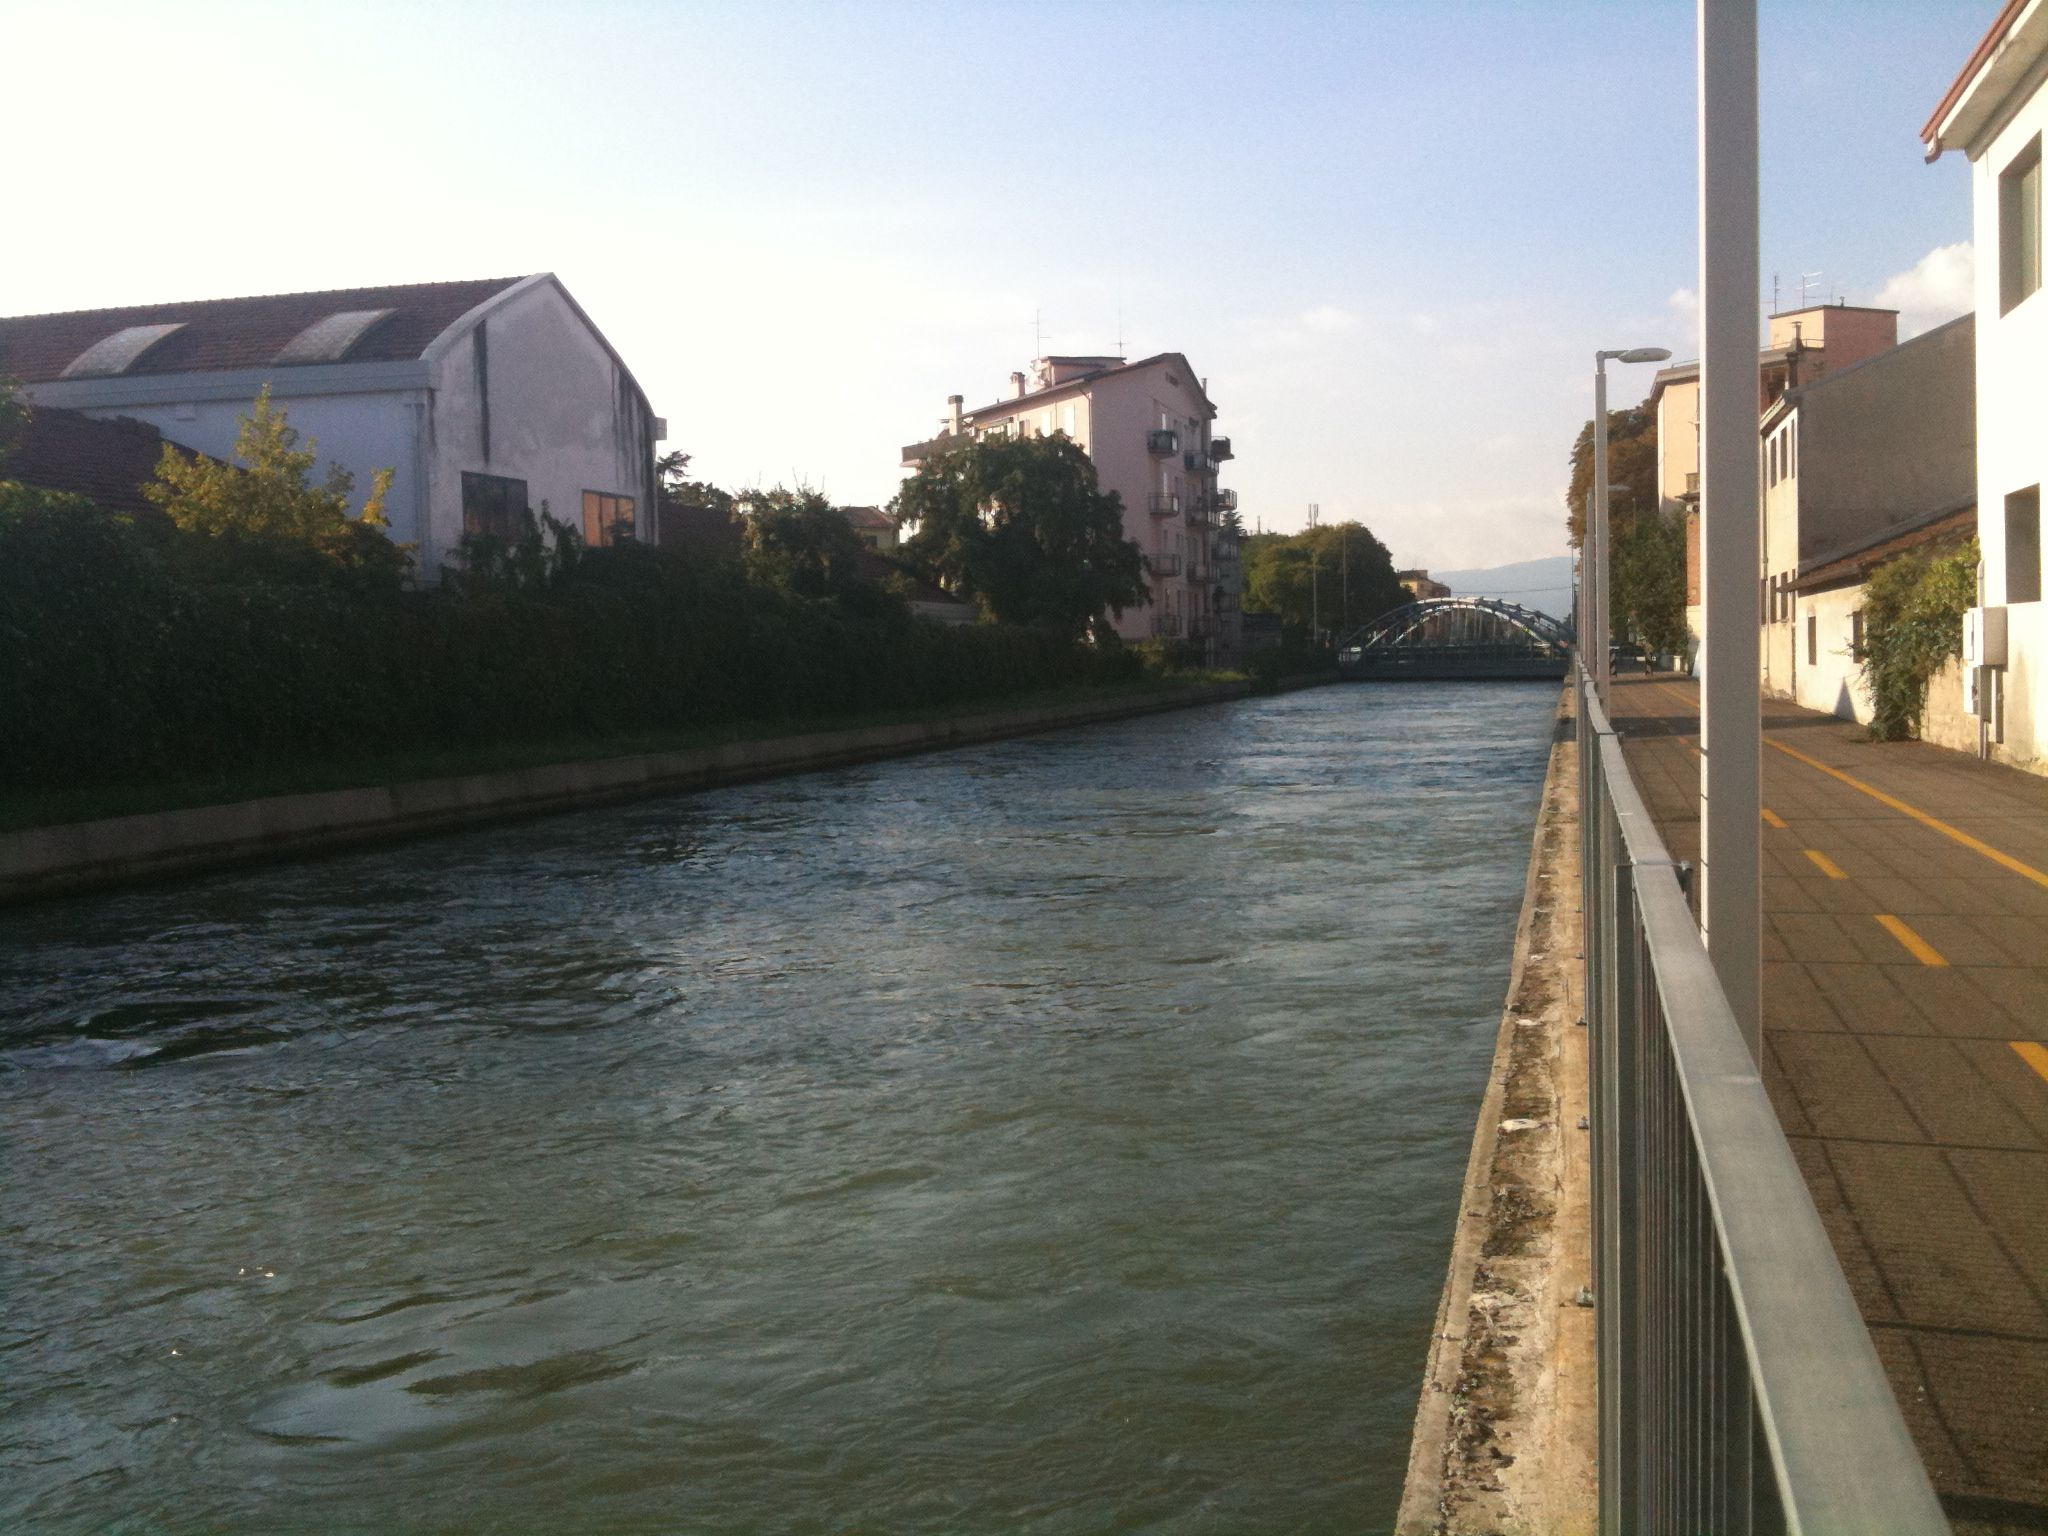 Canal_camuzzoni_-_ponte